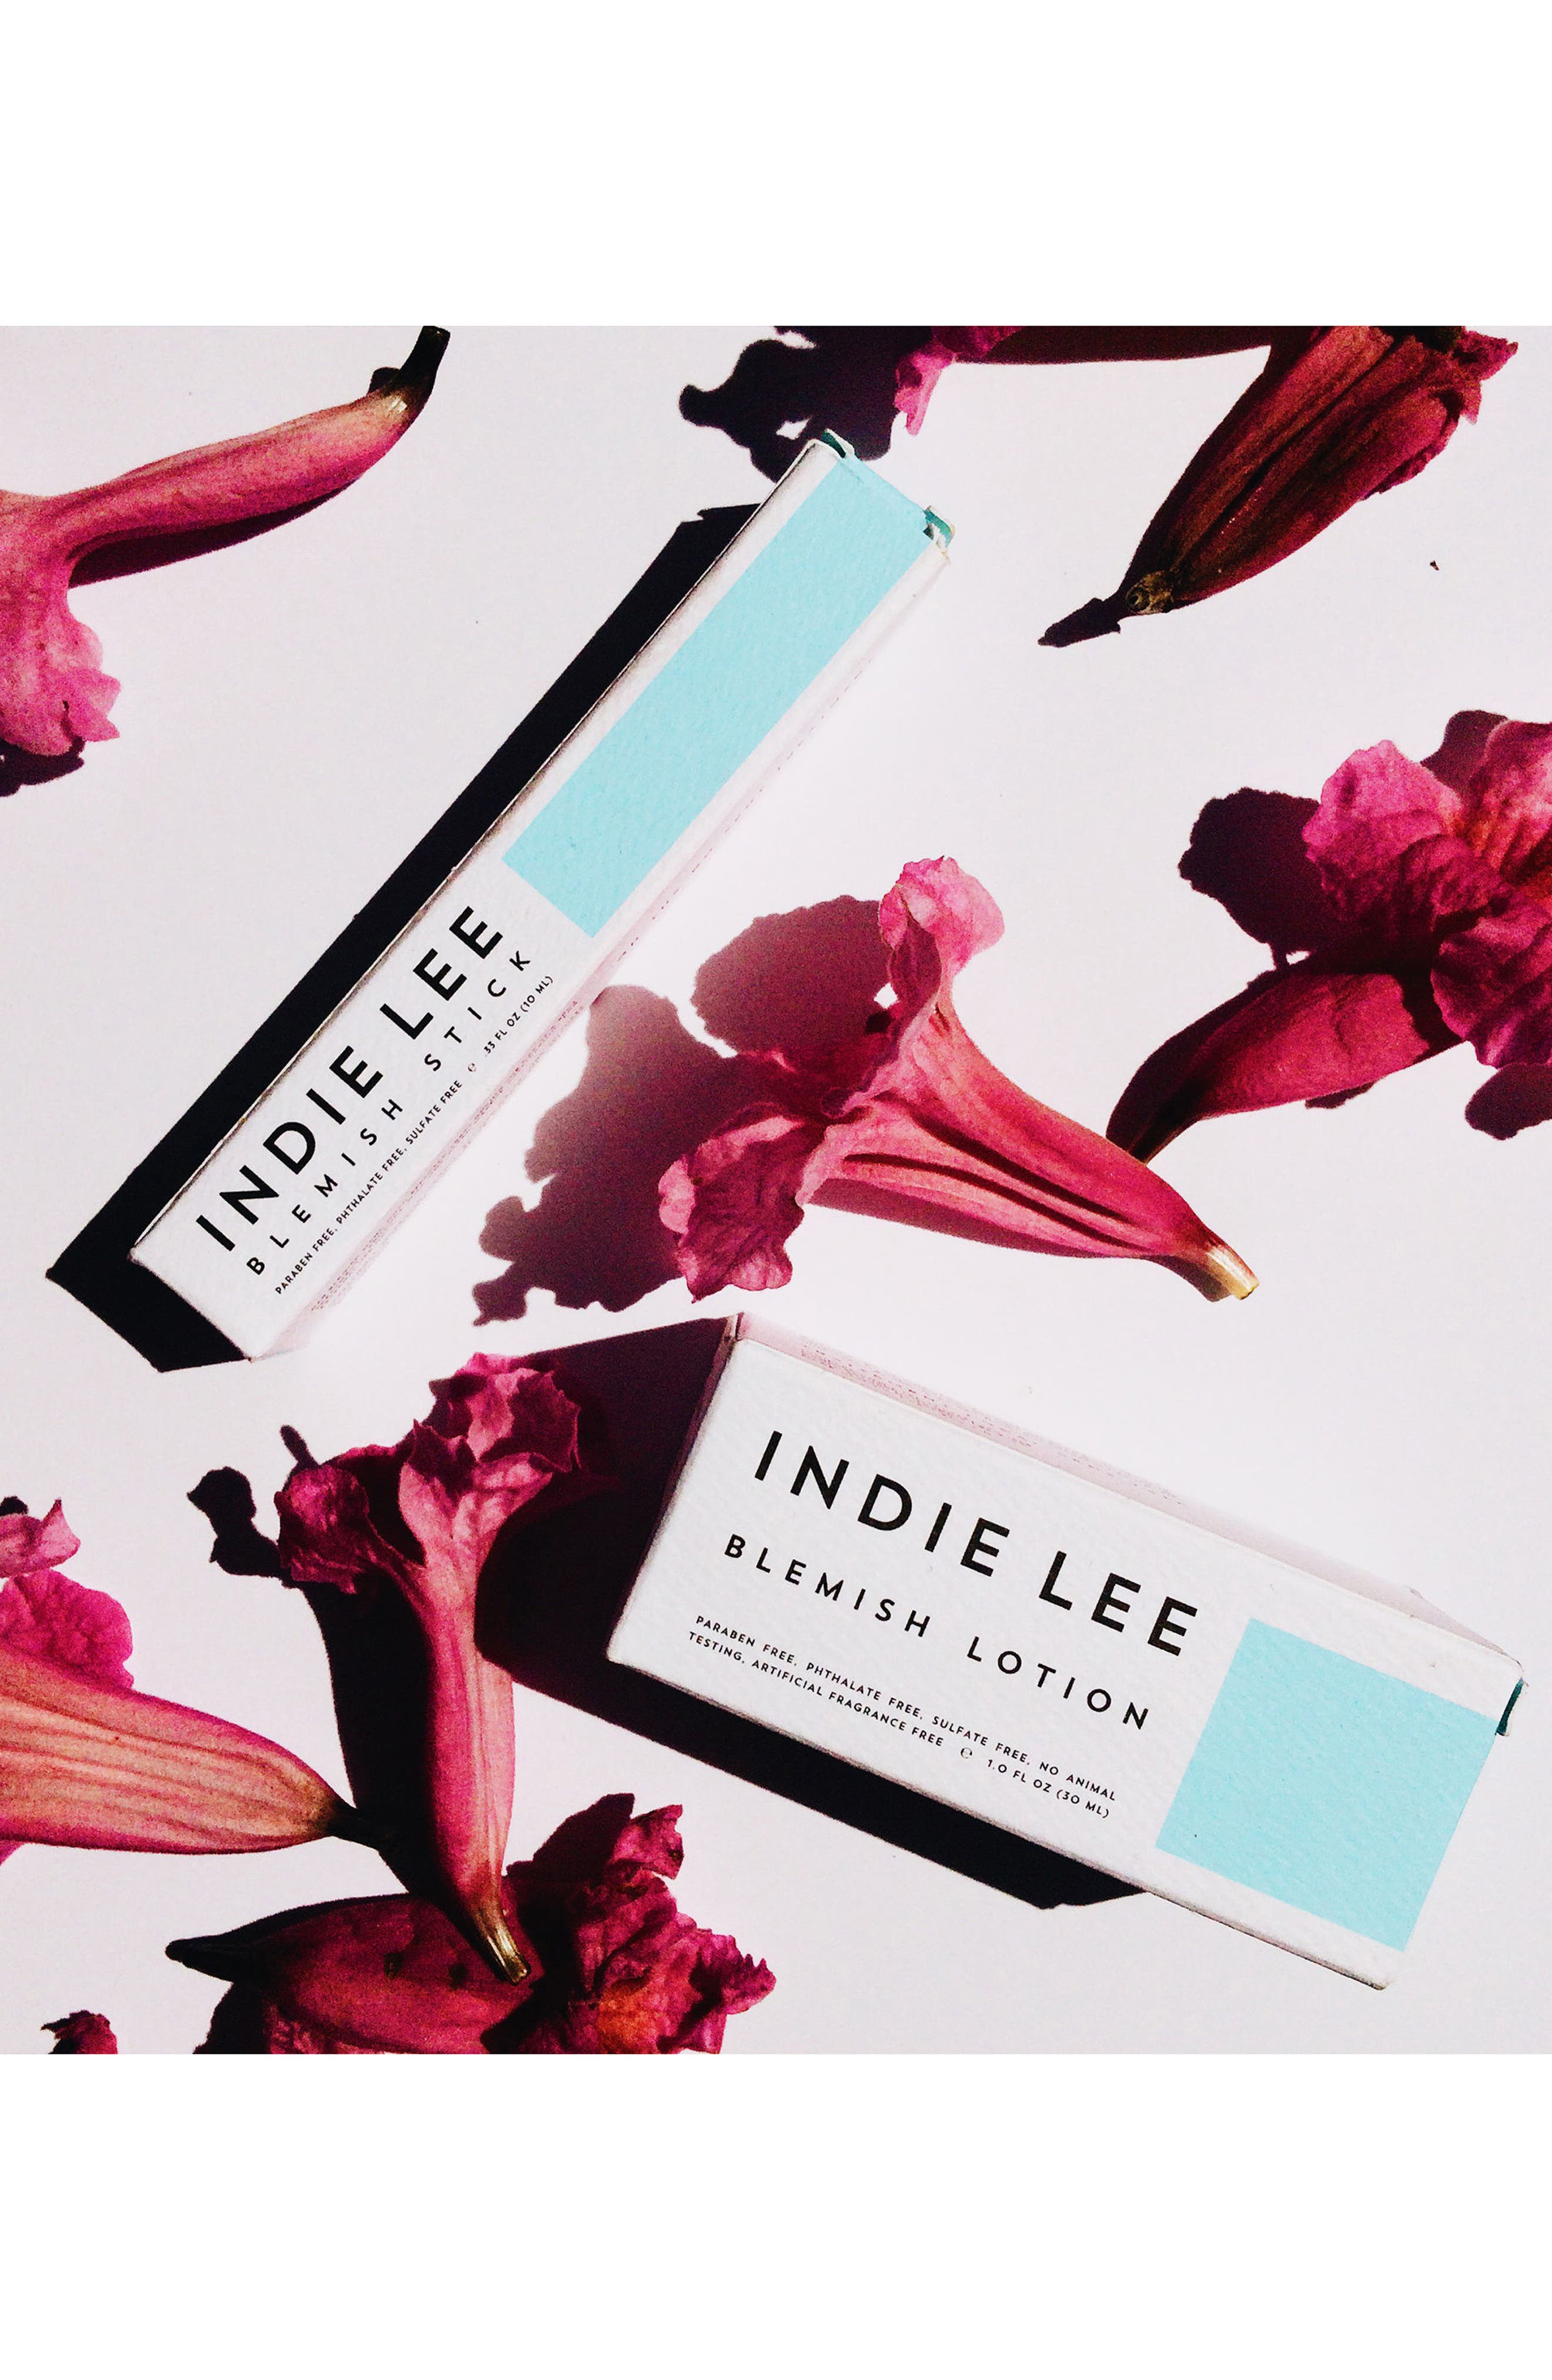 Alternate Image 2  - Indie Lee Blemish Stick